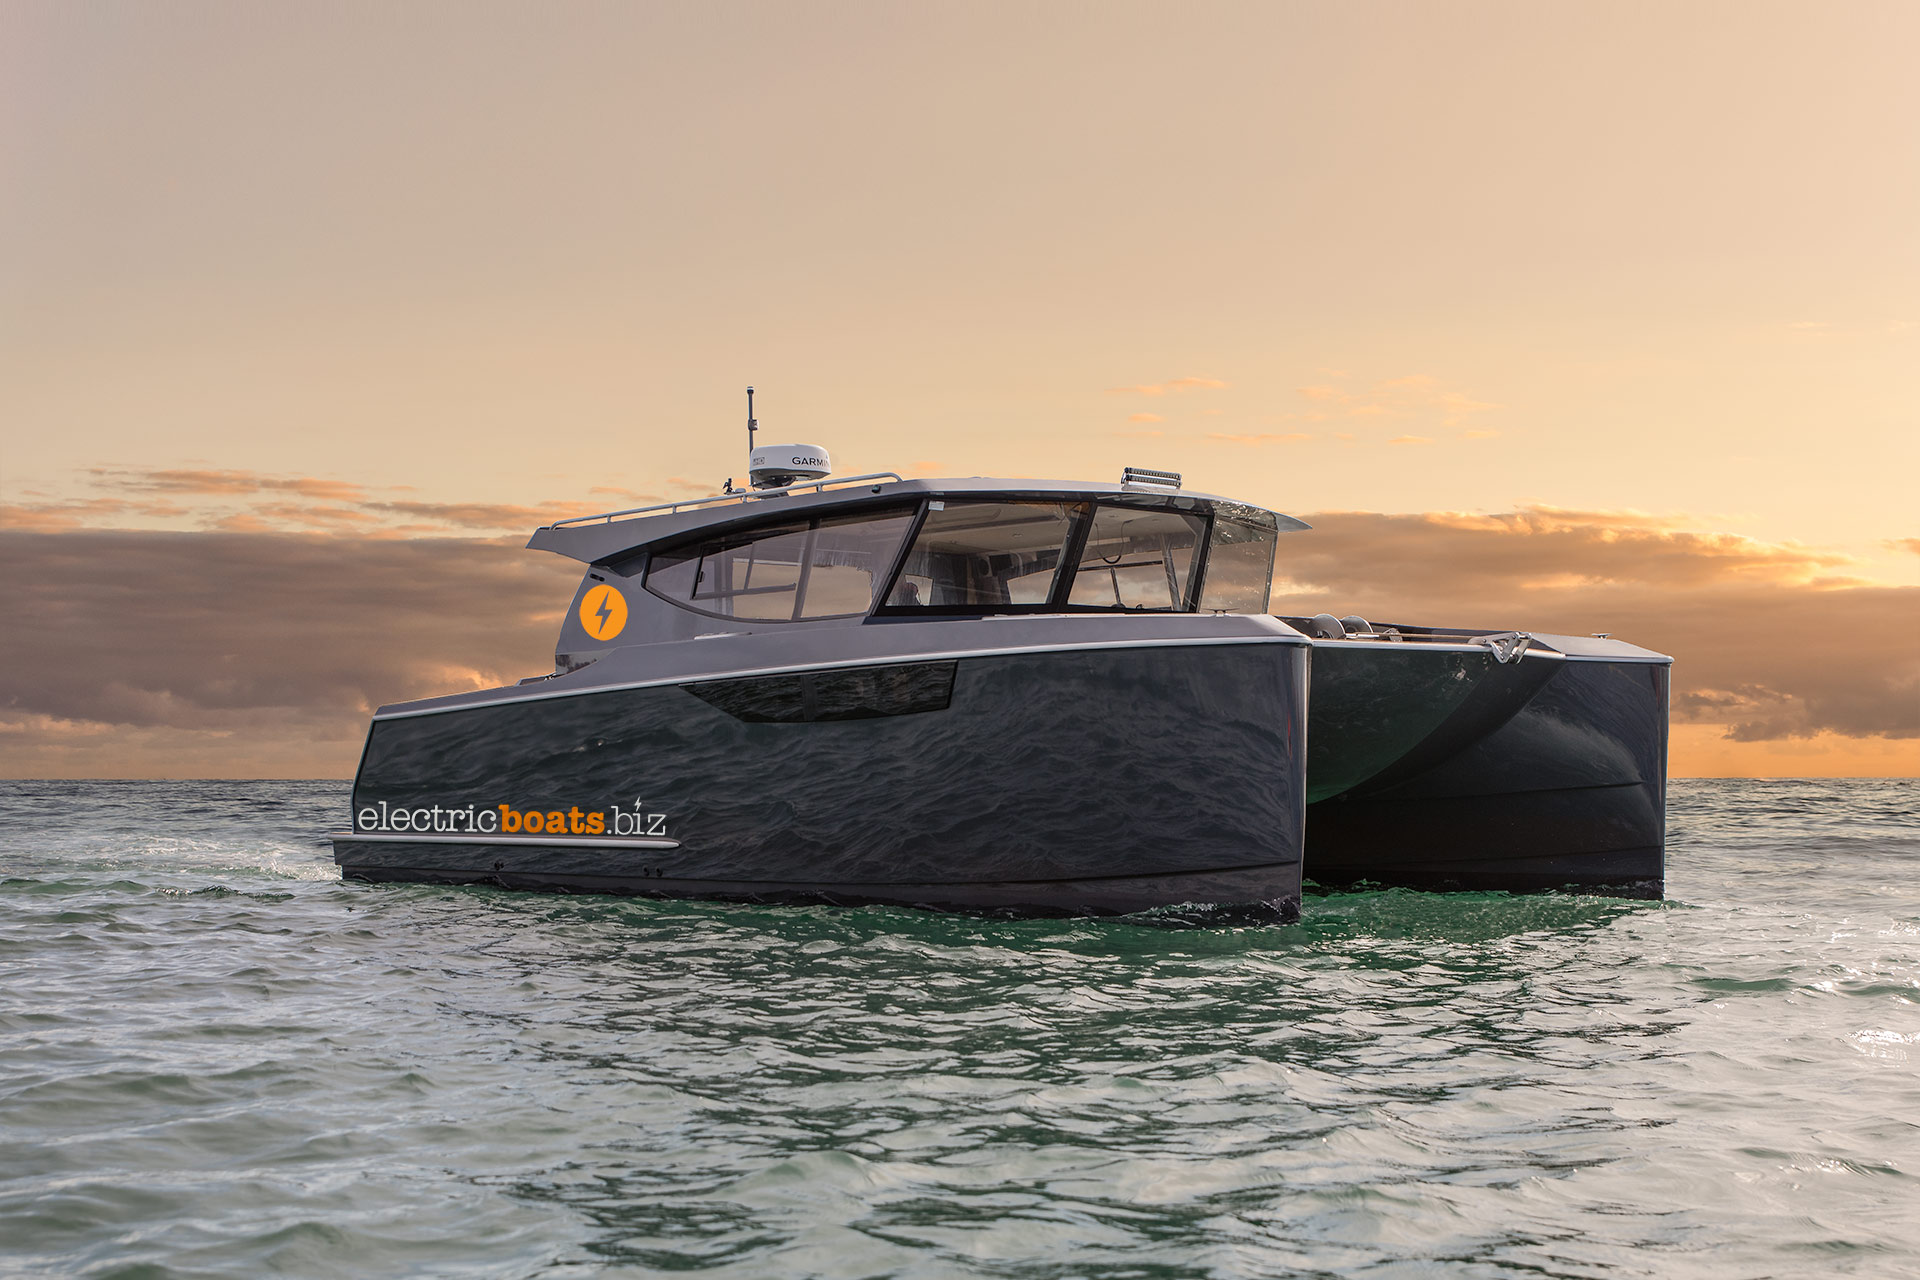 Electric Boats Hybrid Catamaran